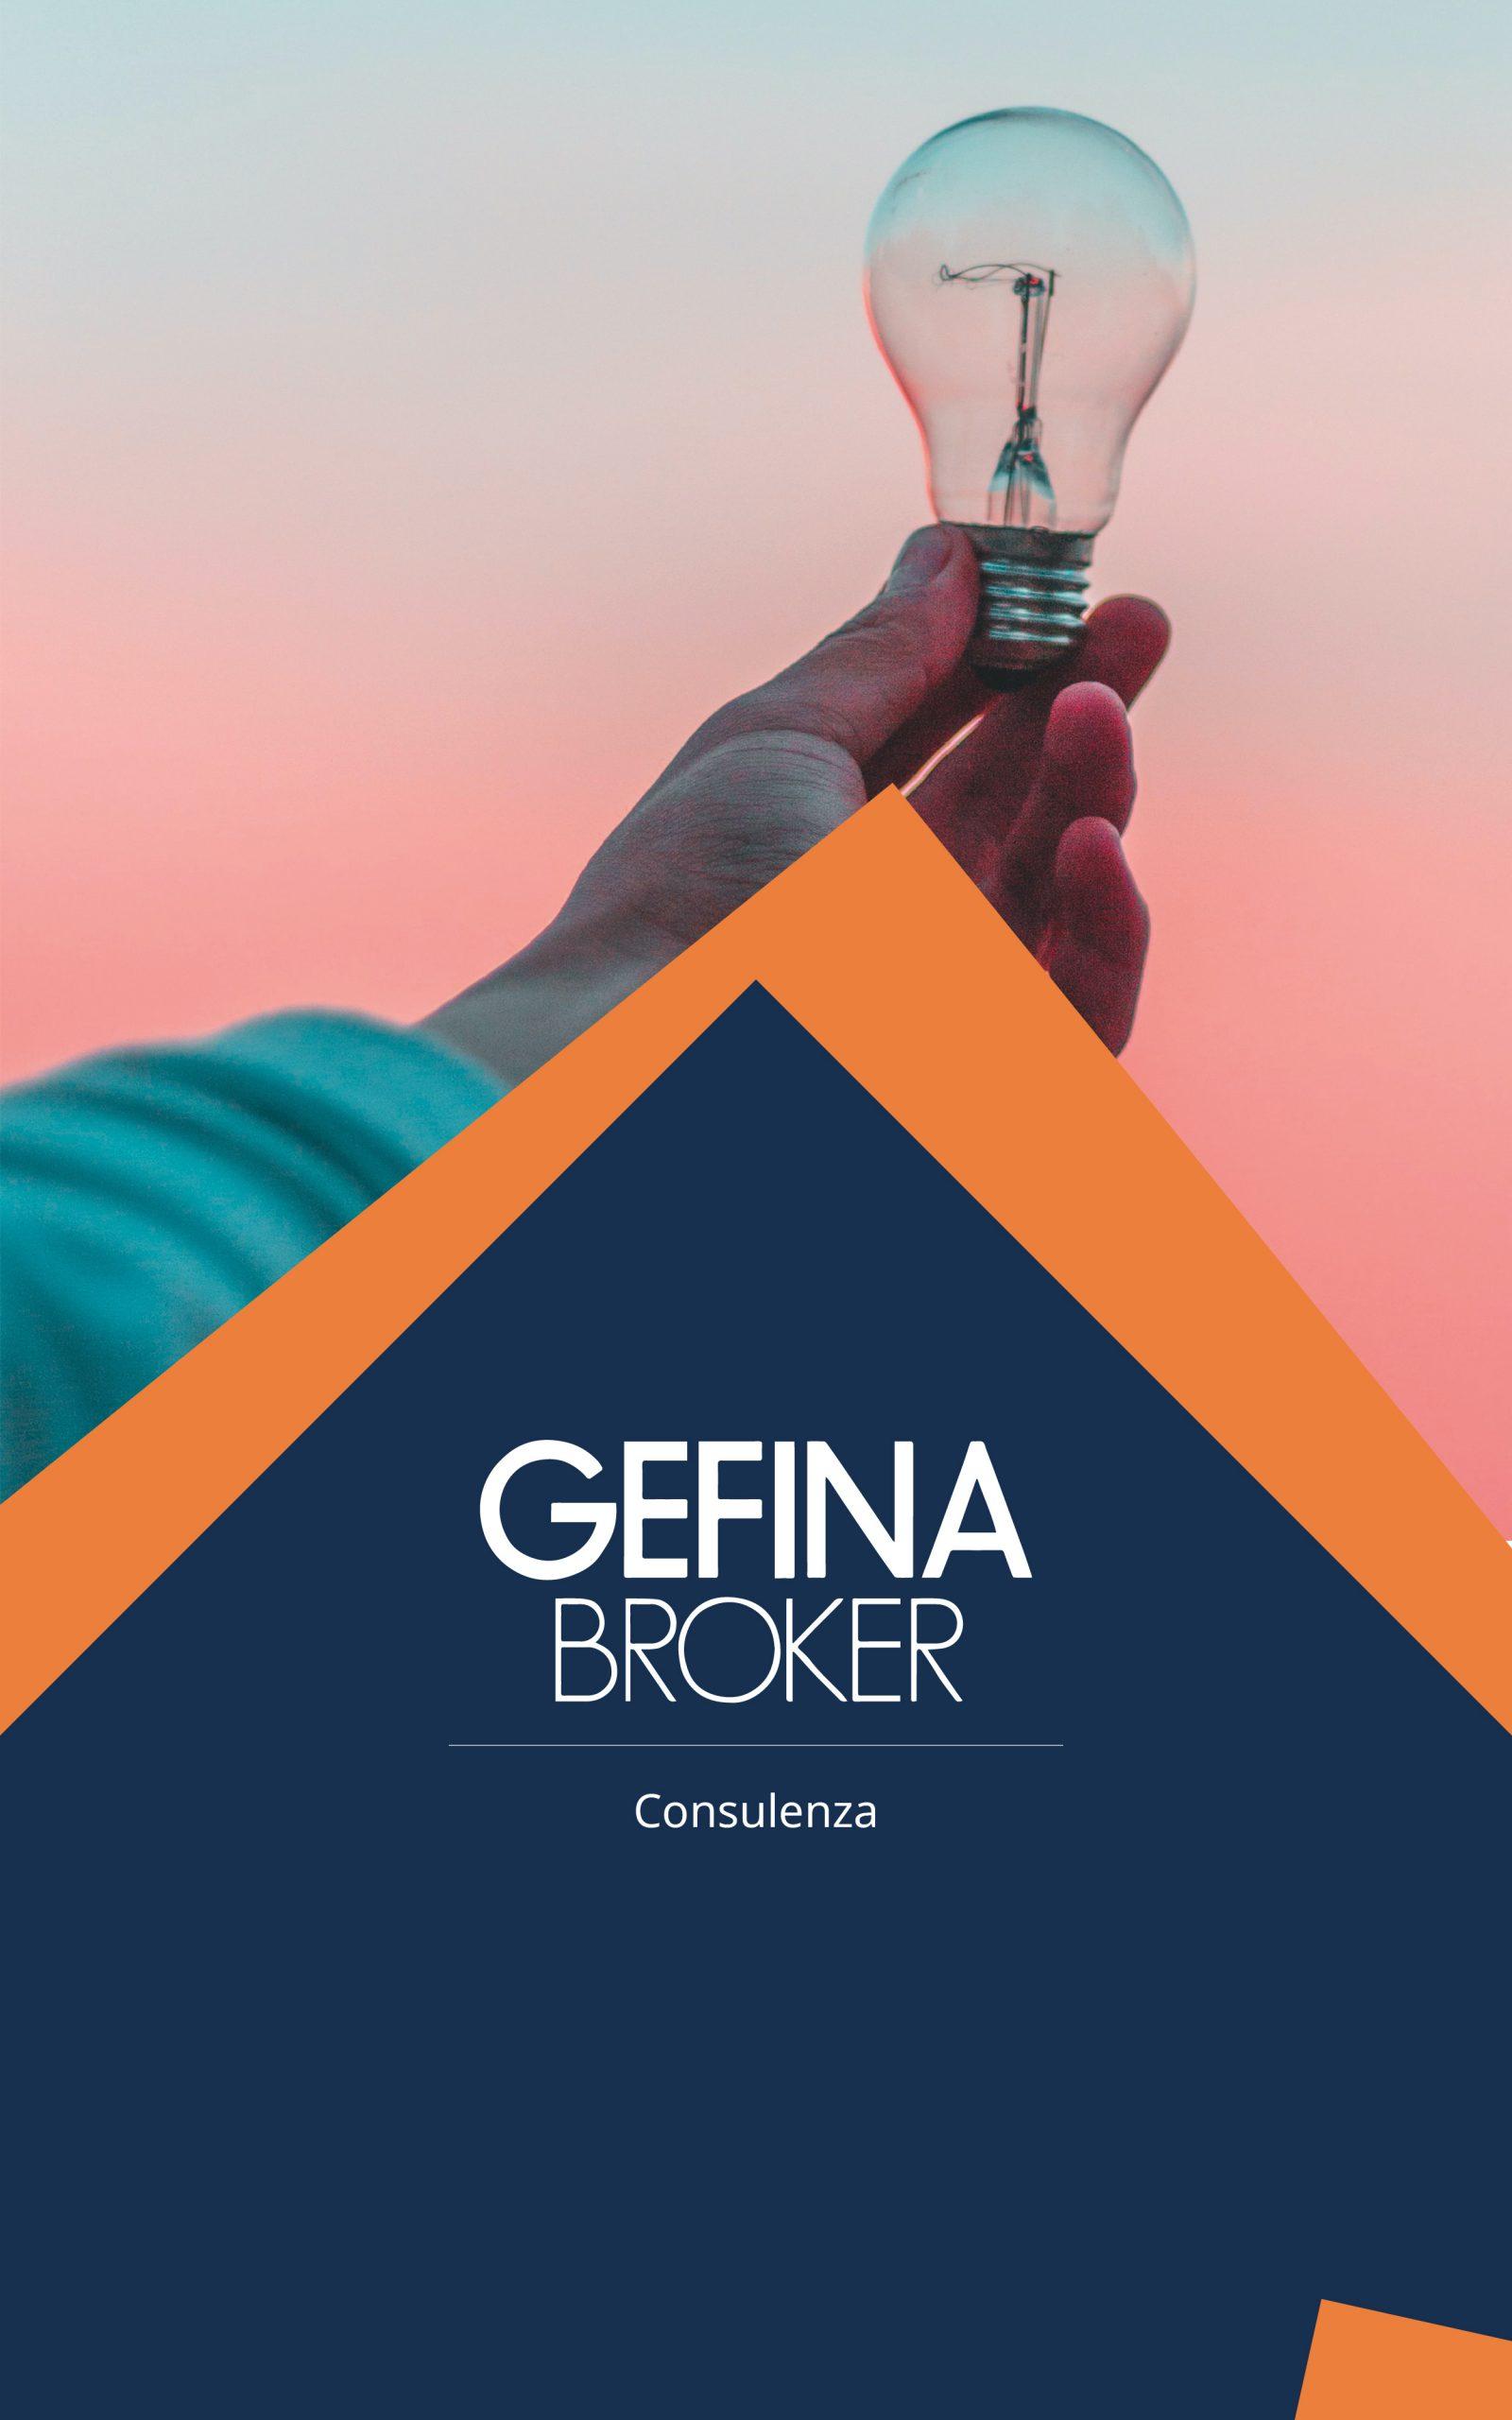 Gefina Broker Consulenza